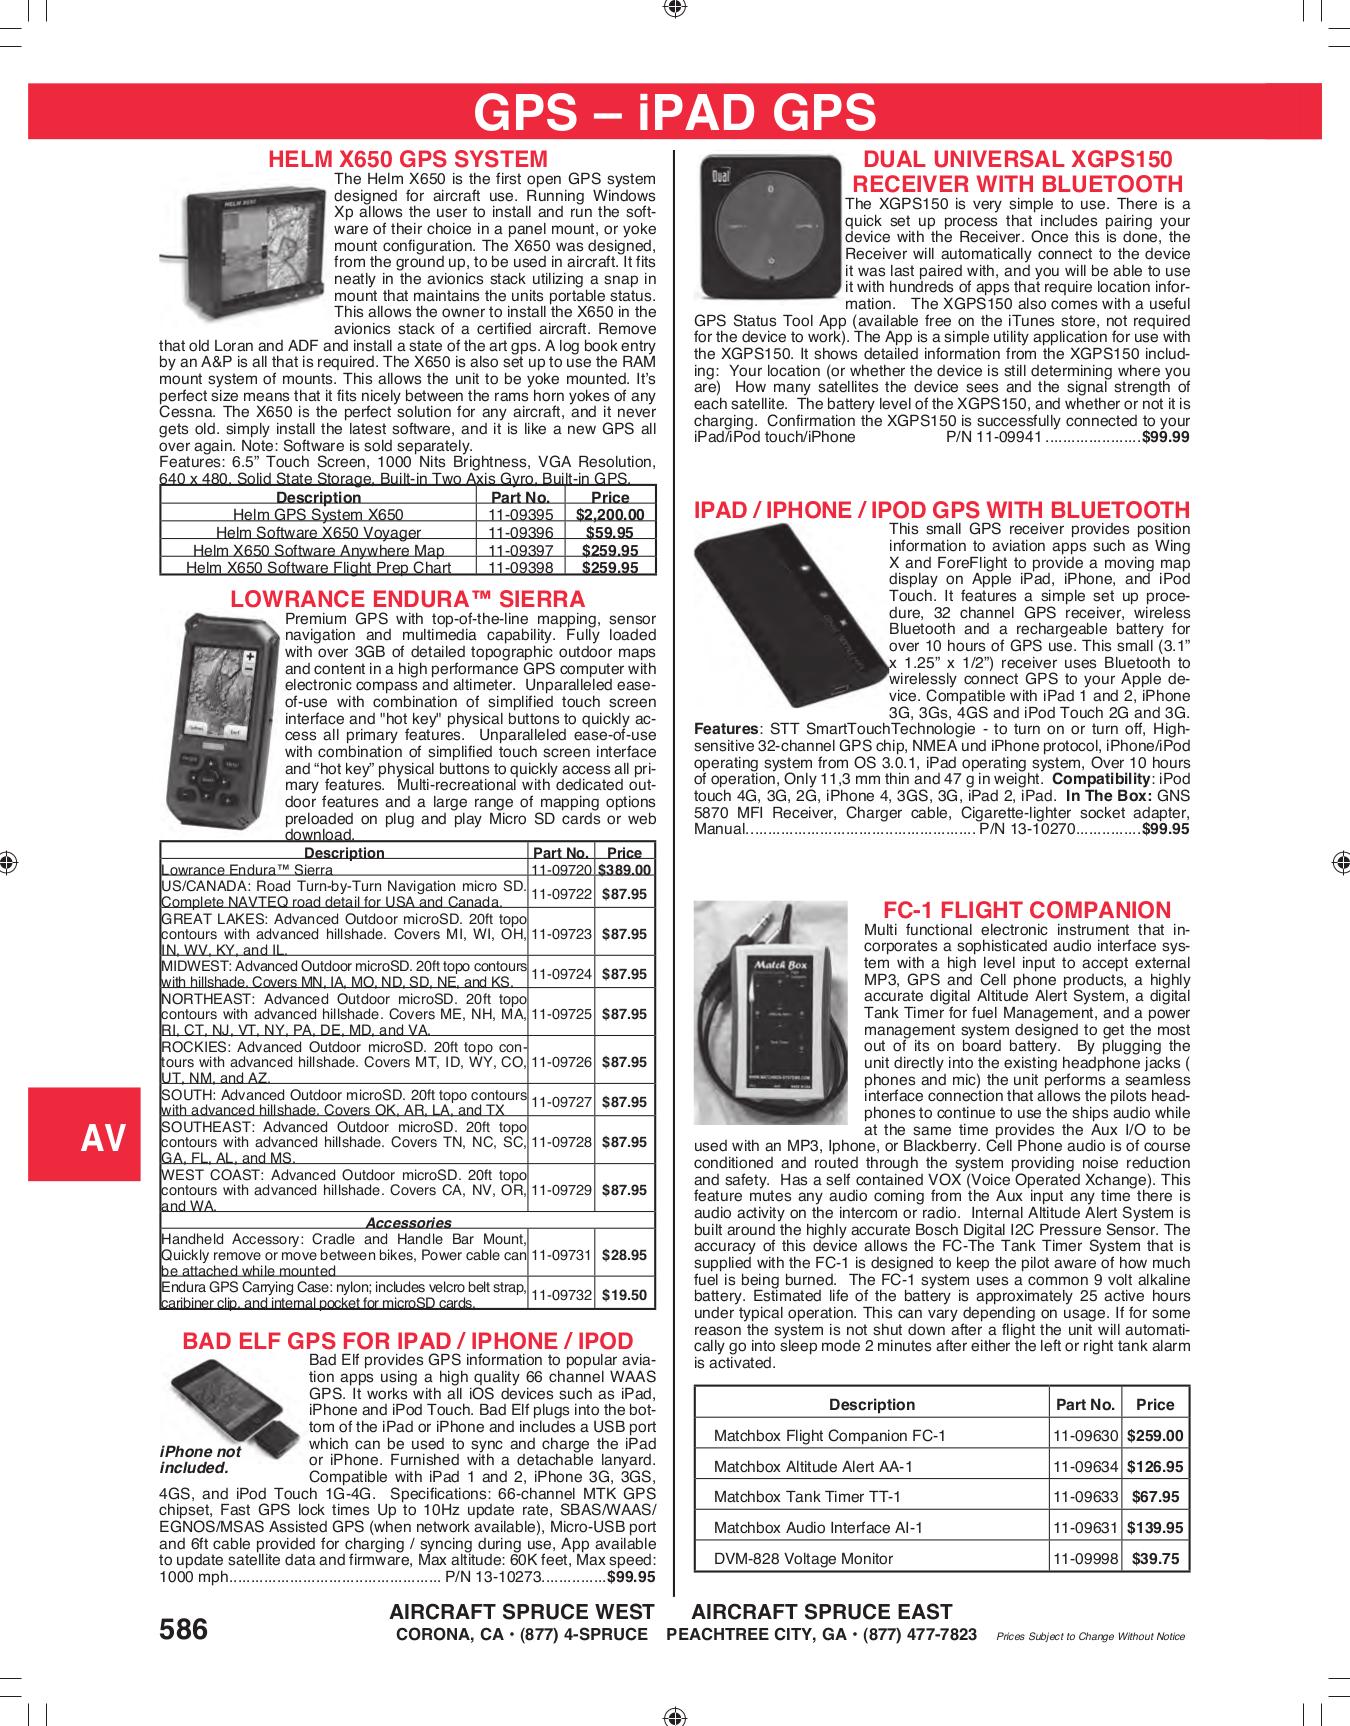 pdf for Lowrance GPS Endura Sierra manual